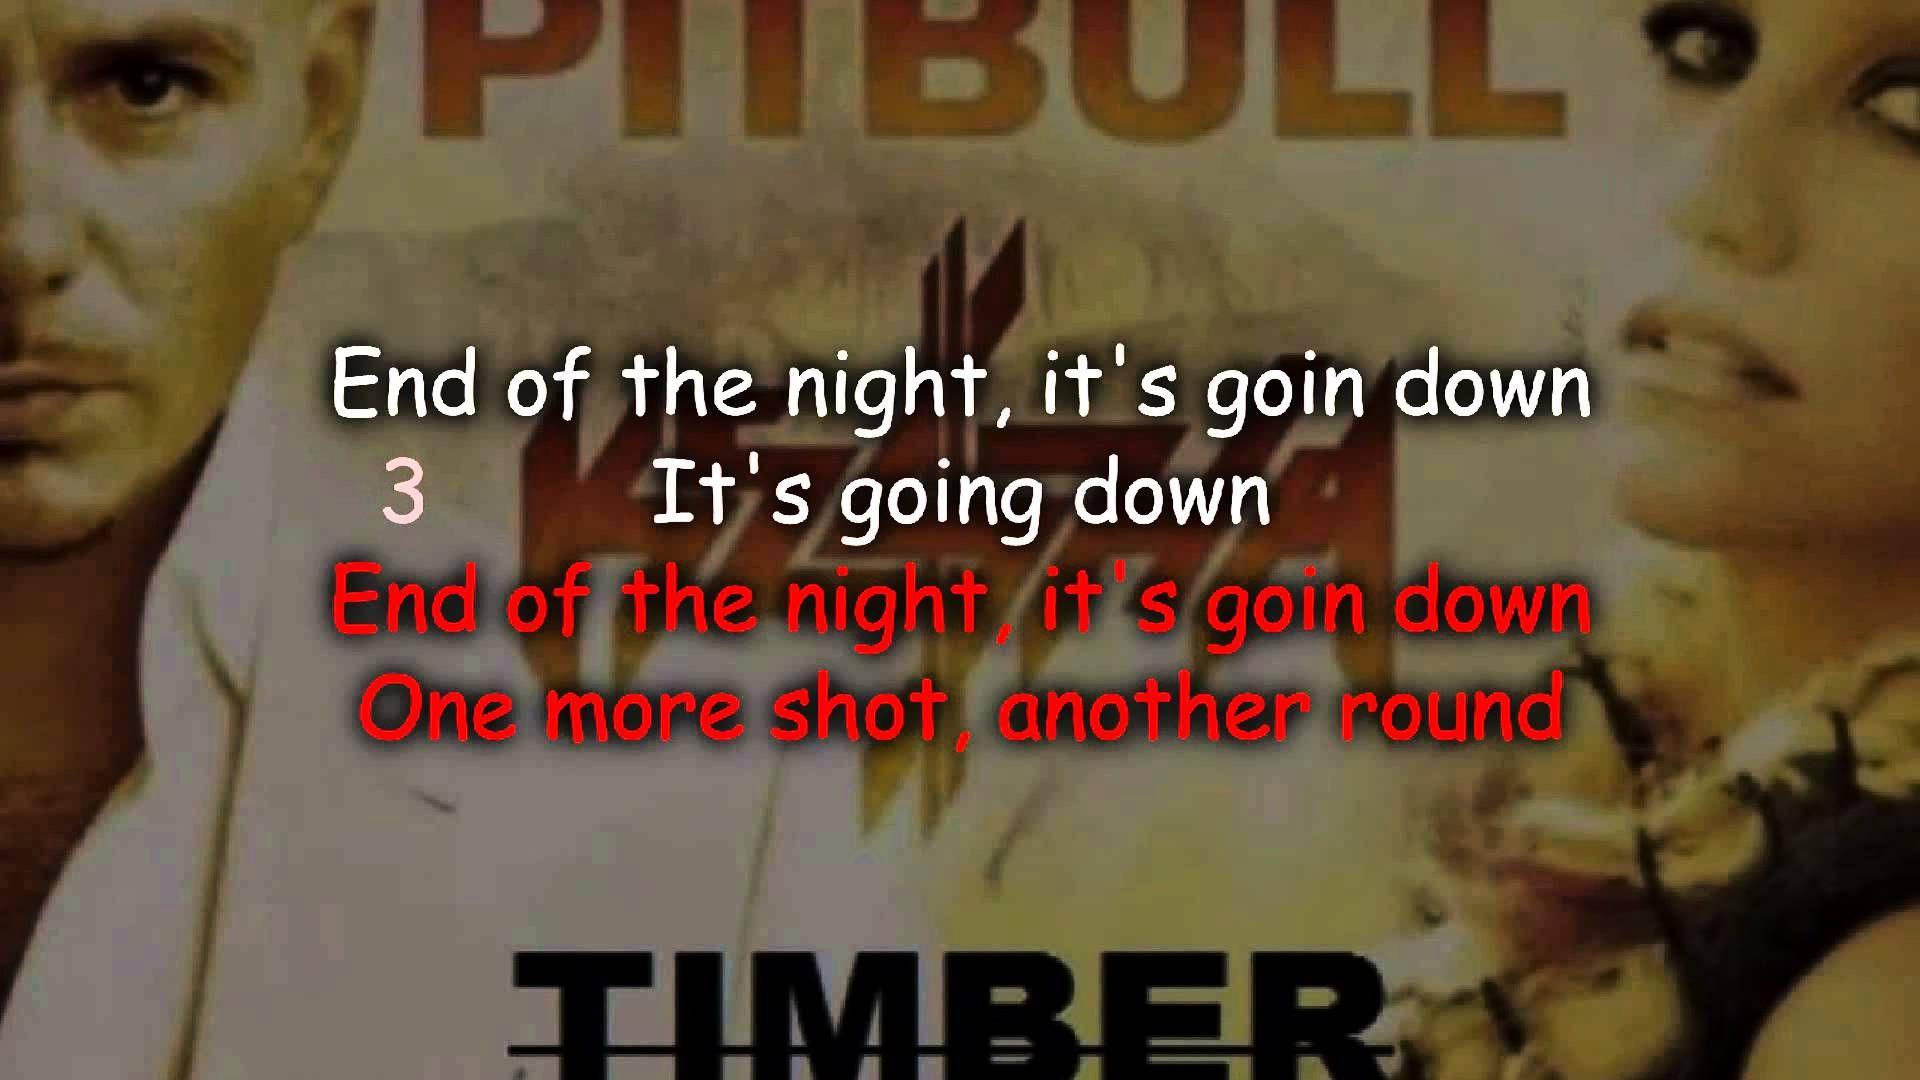 Pitbull ft. Keha Timber [Karaoke/Lyrics] (With images